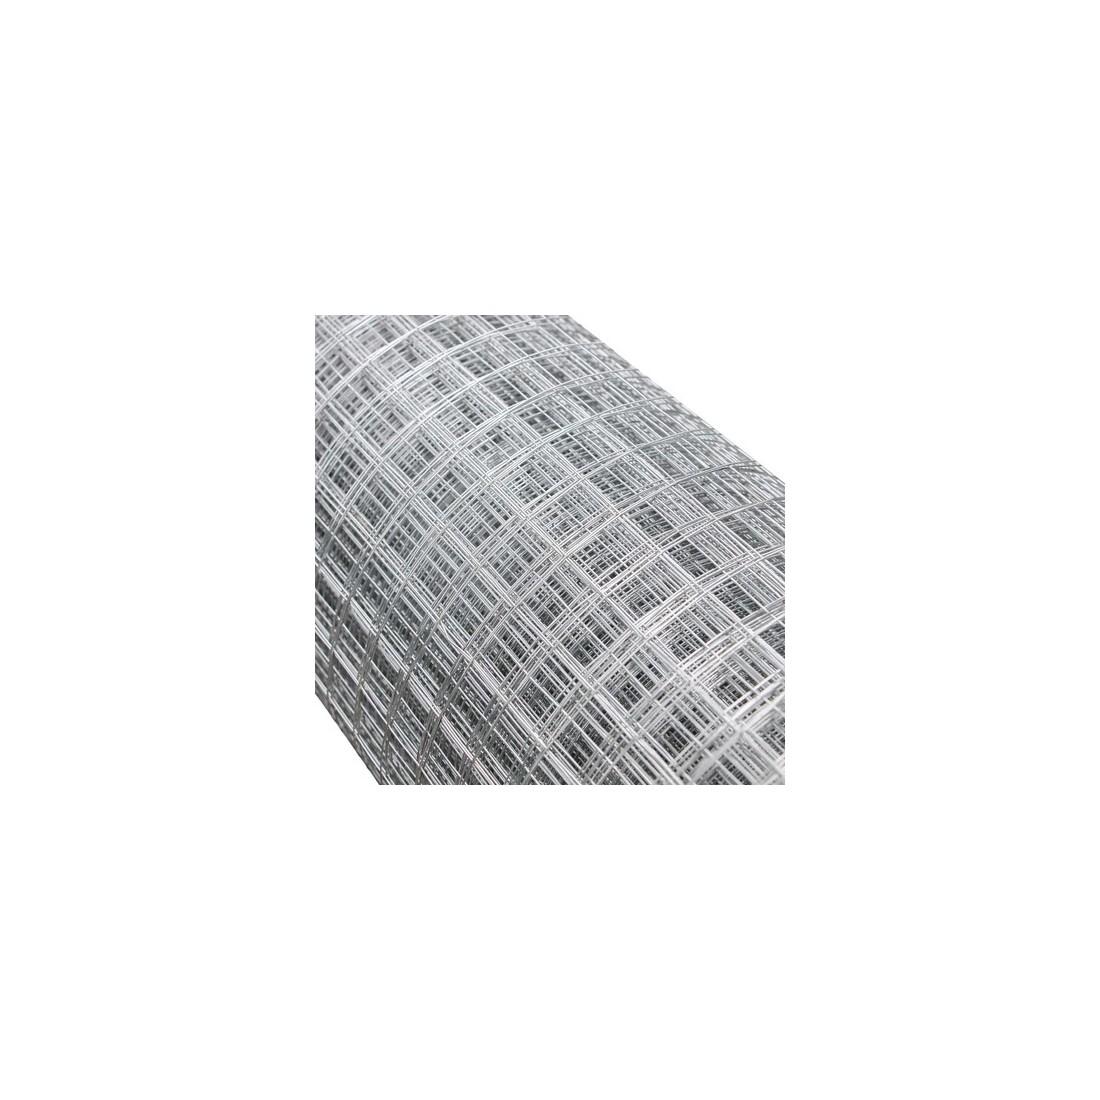 Rete metallica zincata rotolo 1.50 x 25